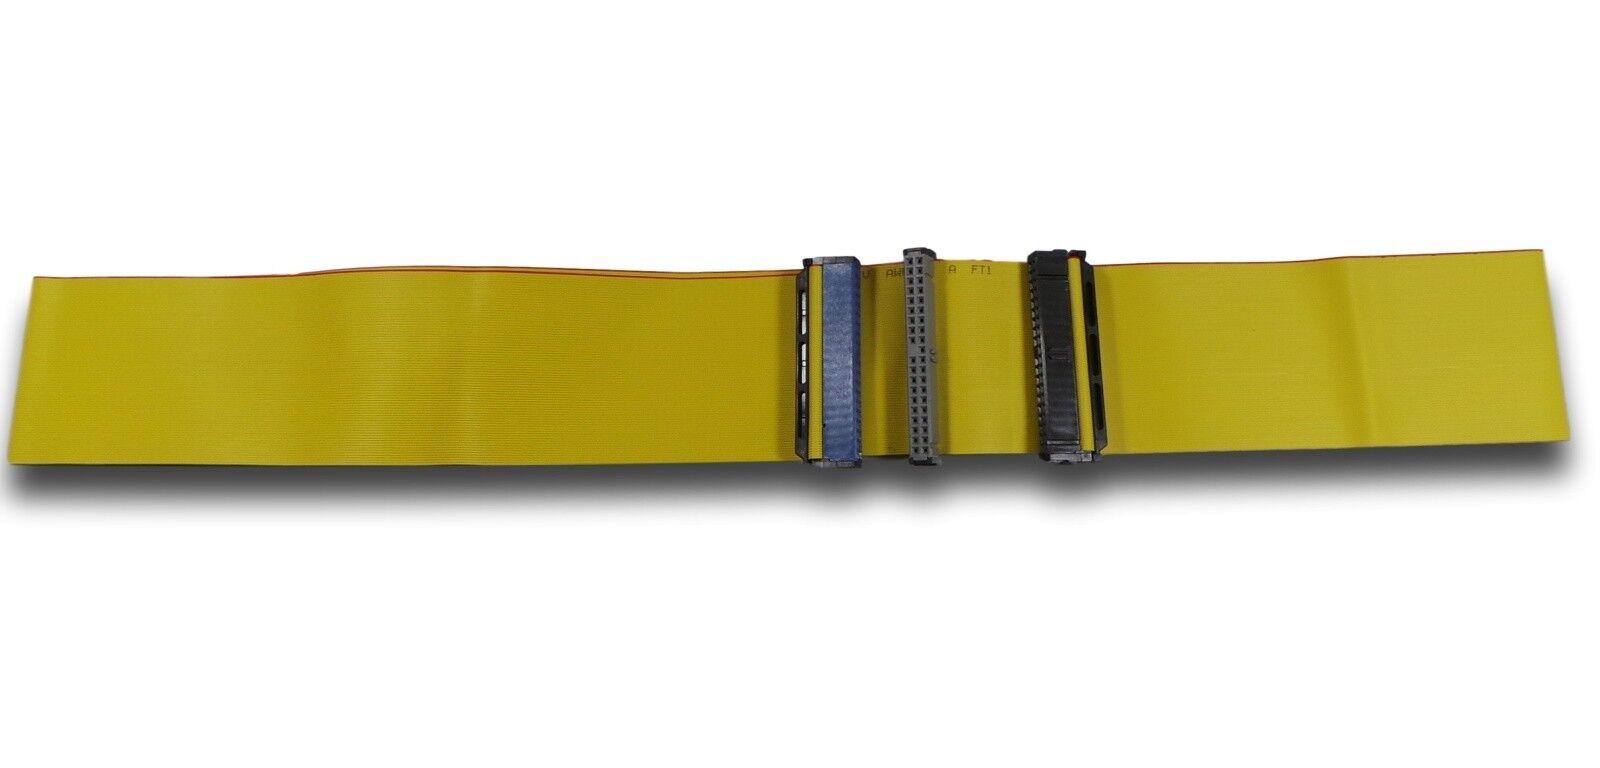 0,75m Ide 80pol Ribbon Cable #o272